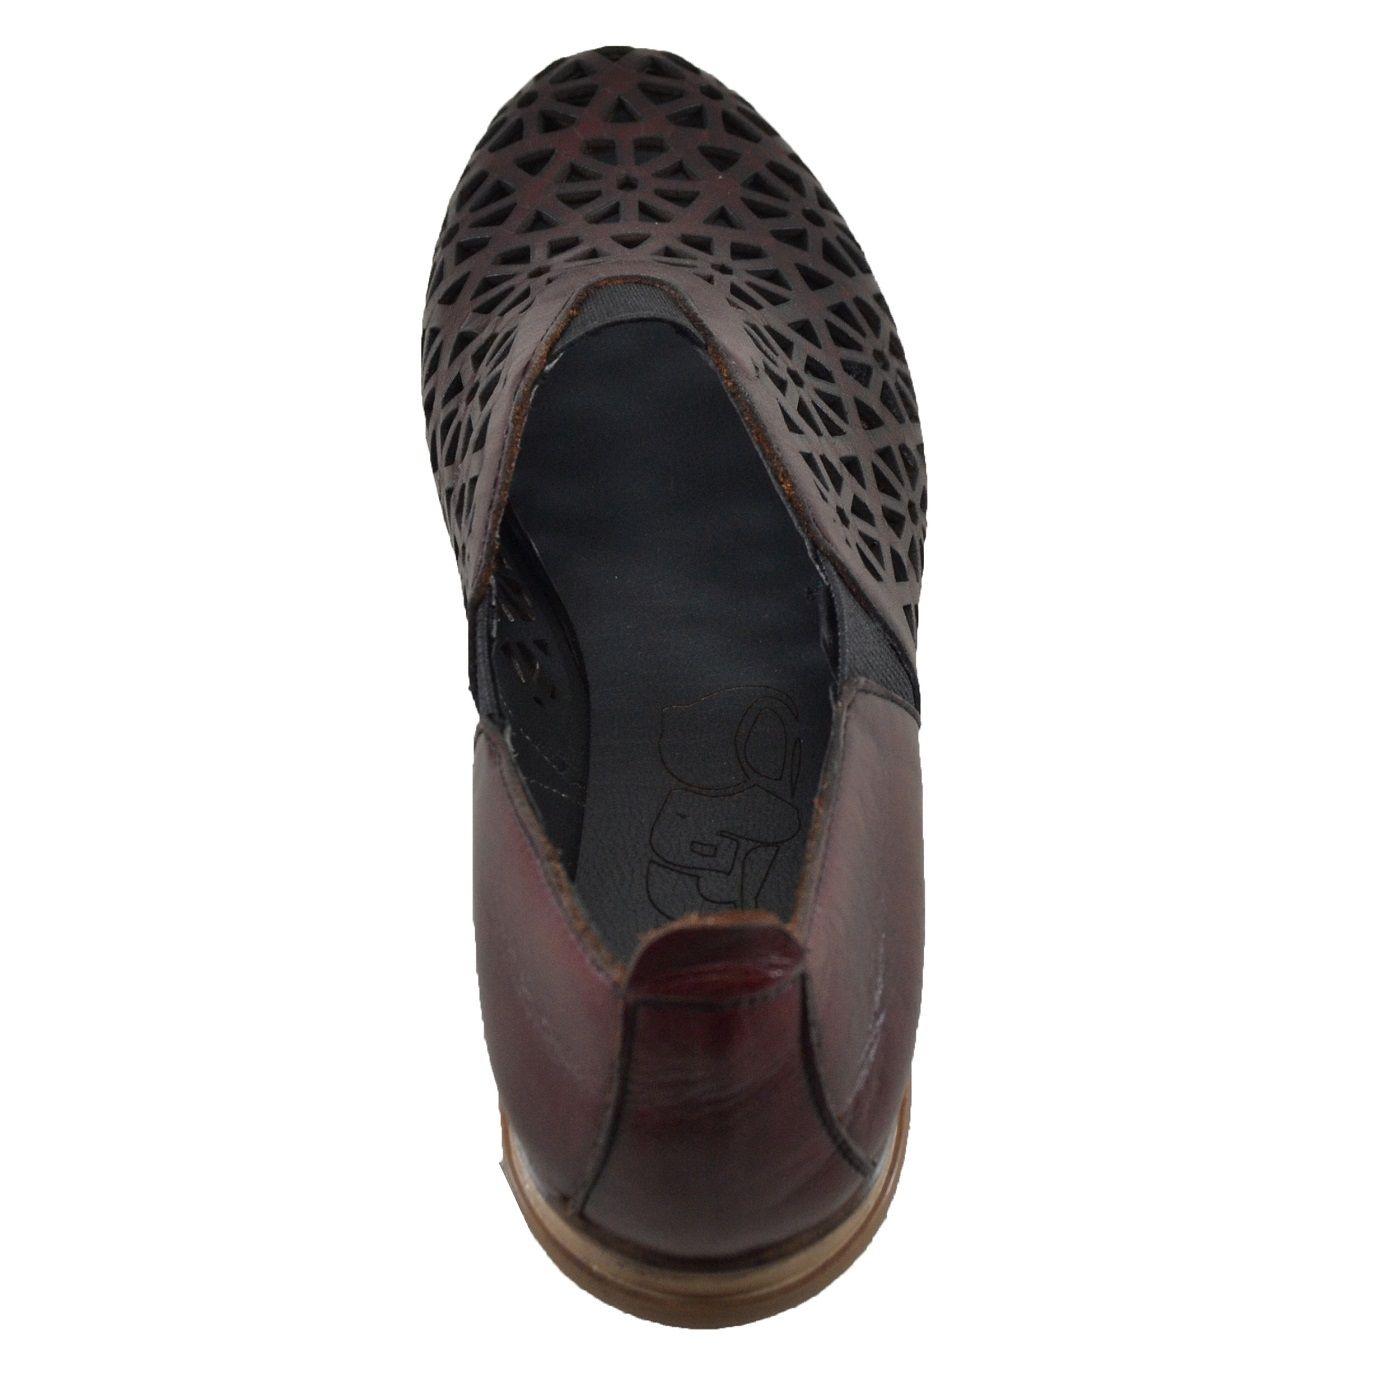 کفش زنانه کد 519 -  - 1